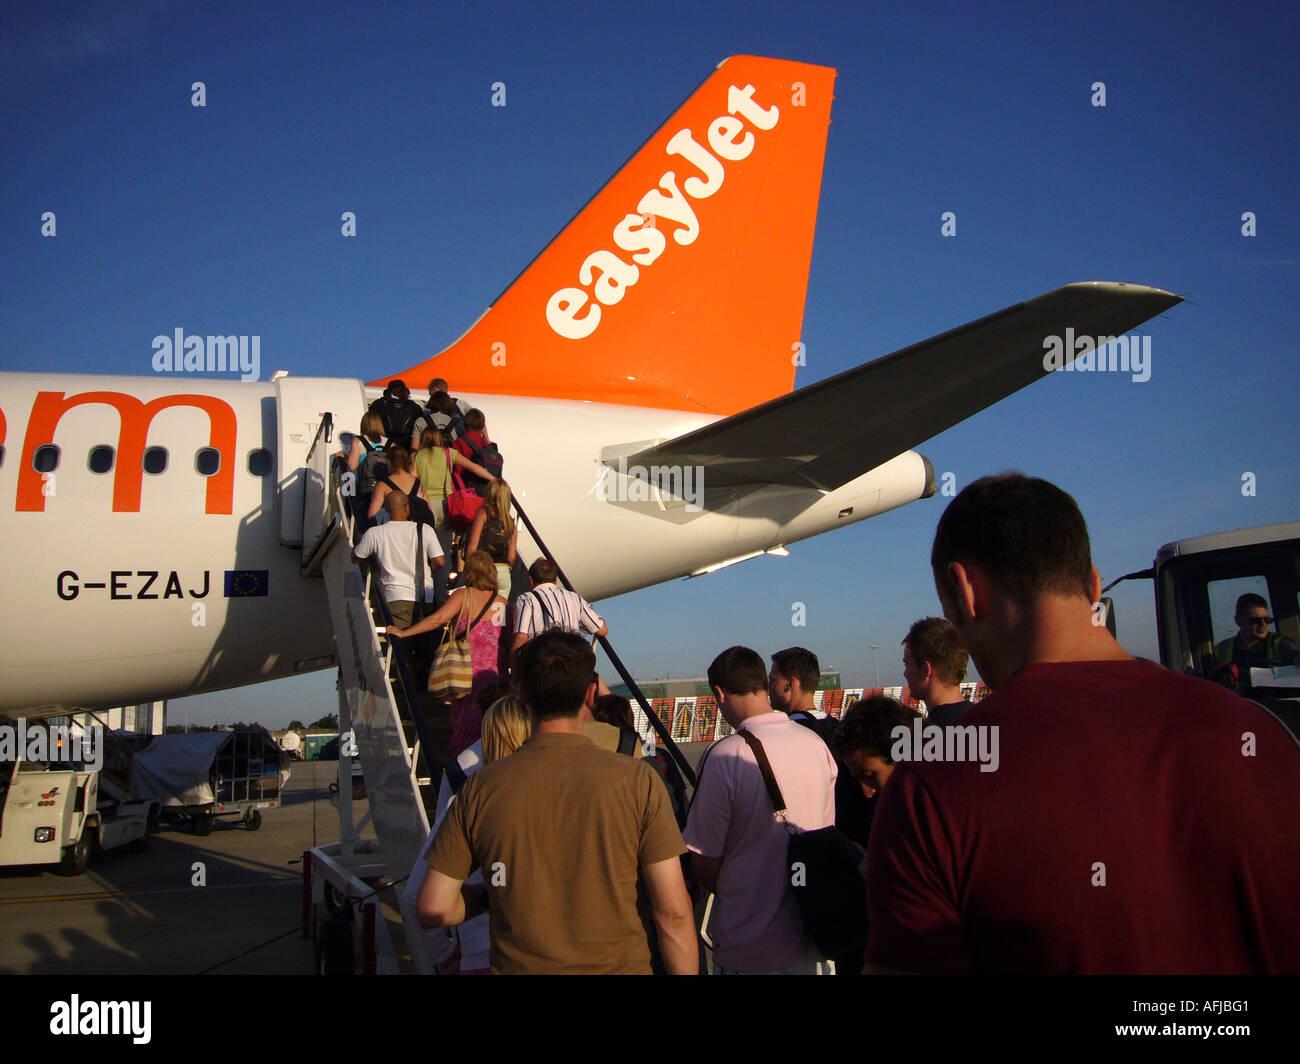 Flying with Easyjet - Stock Image